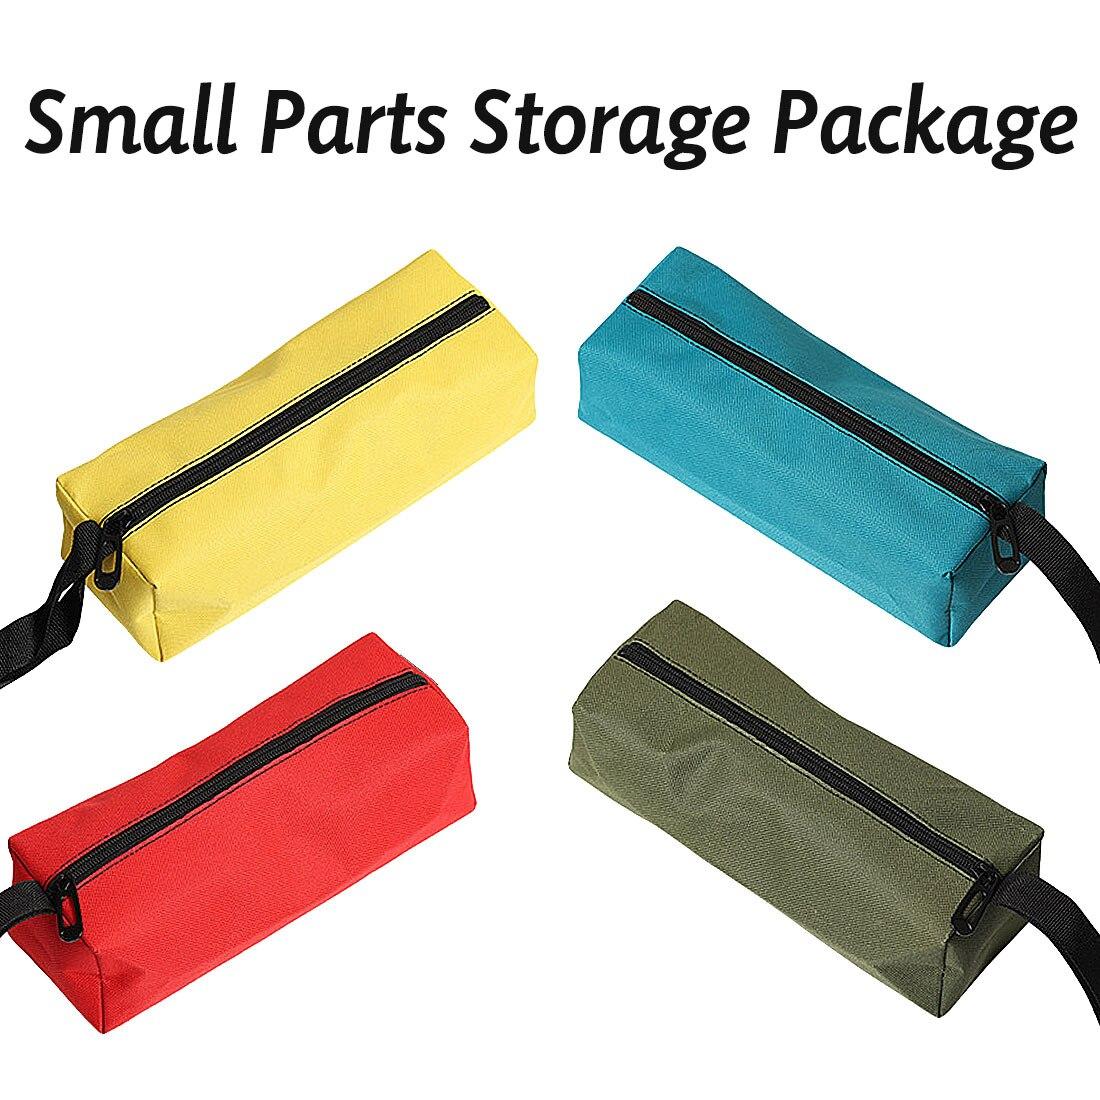 Waterproof Oxford Cloth Fishing Travel Hand Tool Bag Storage Metal PartsScrews Nails Drill Bit Makeup Organizer Pouch Bag Case